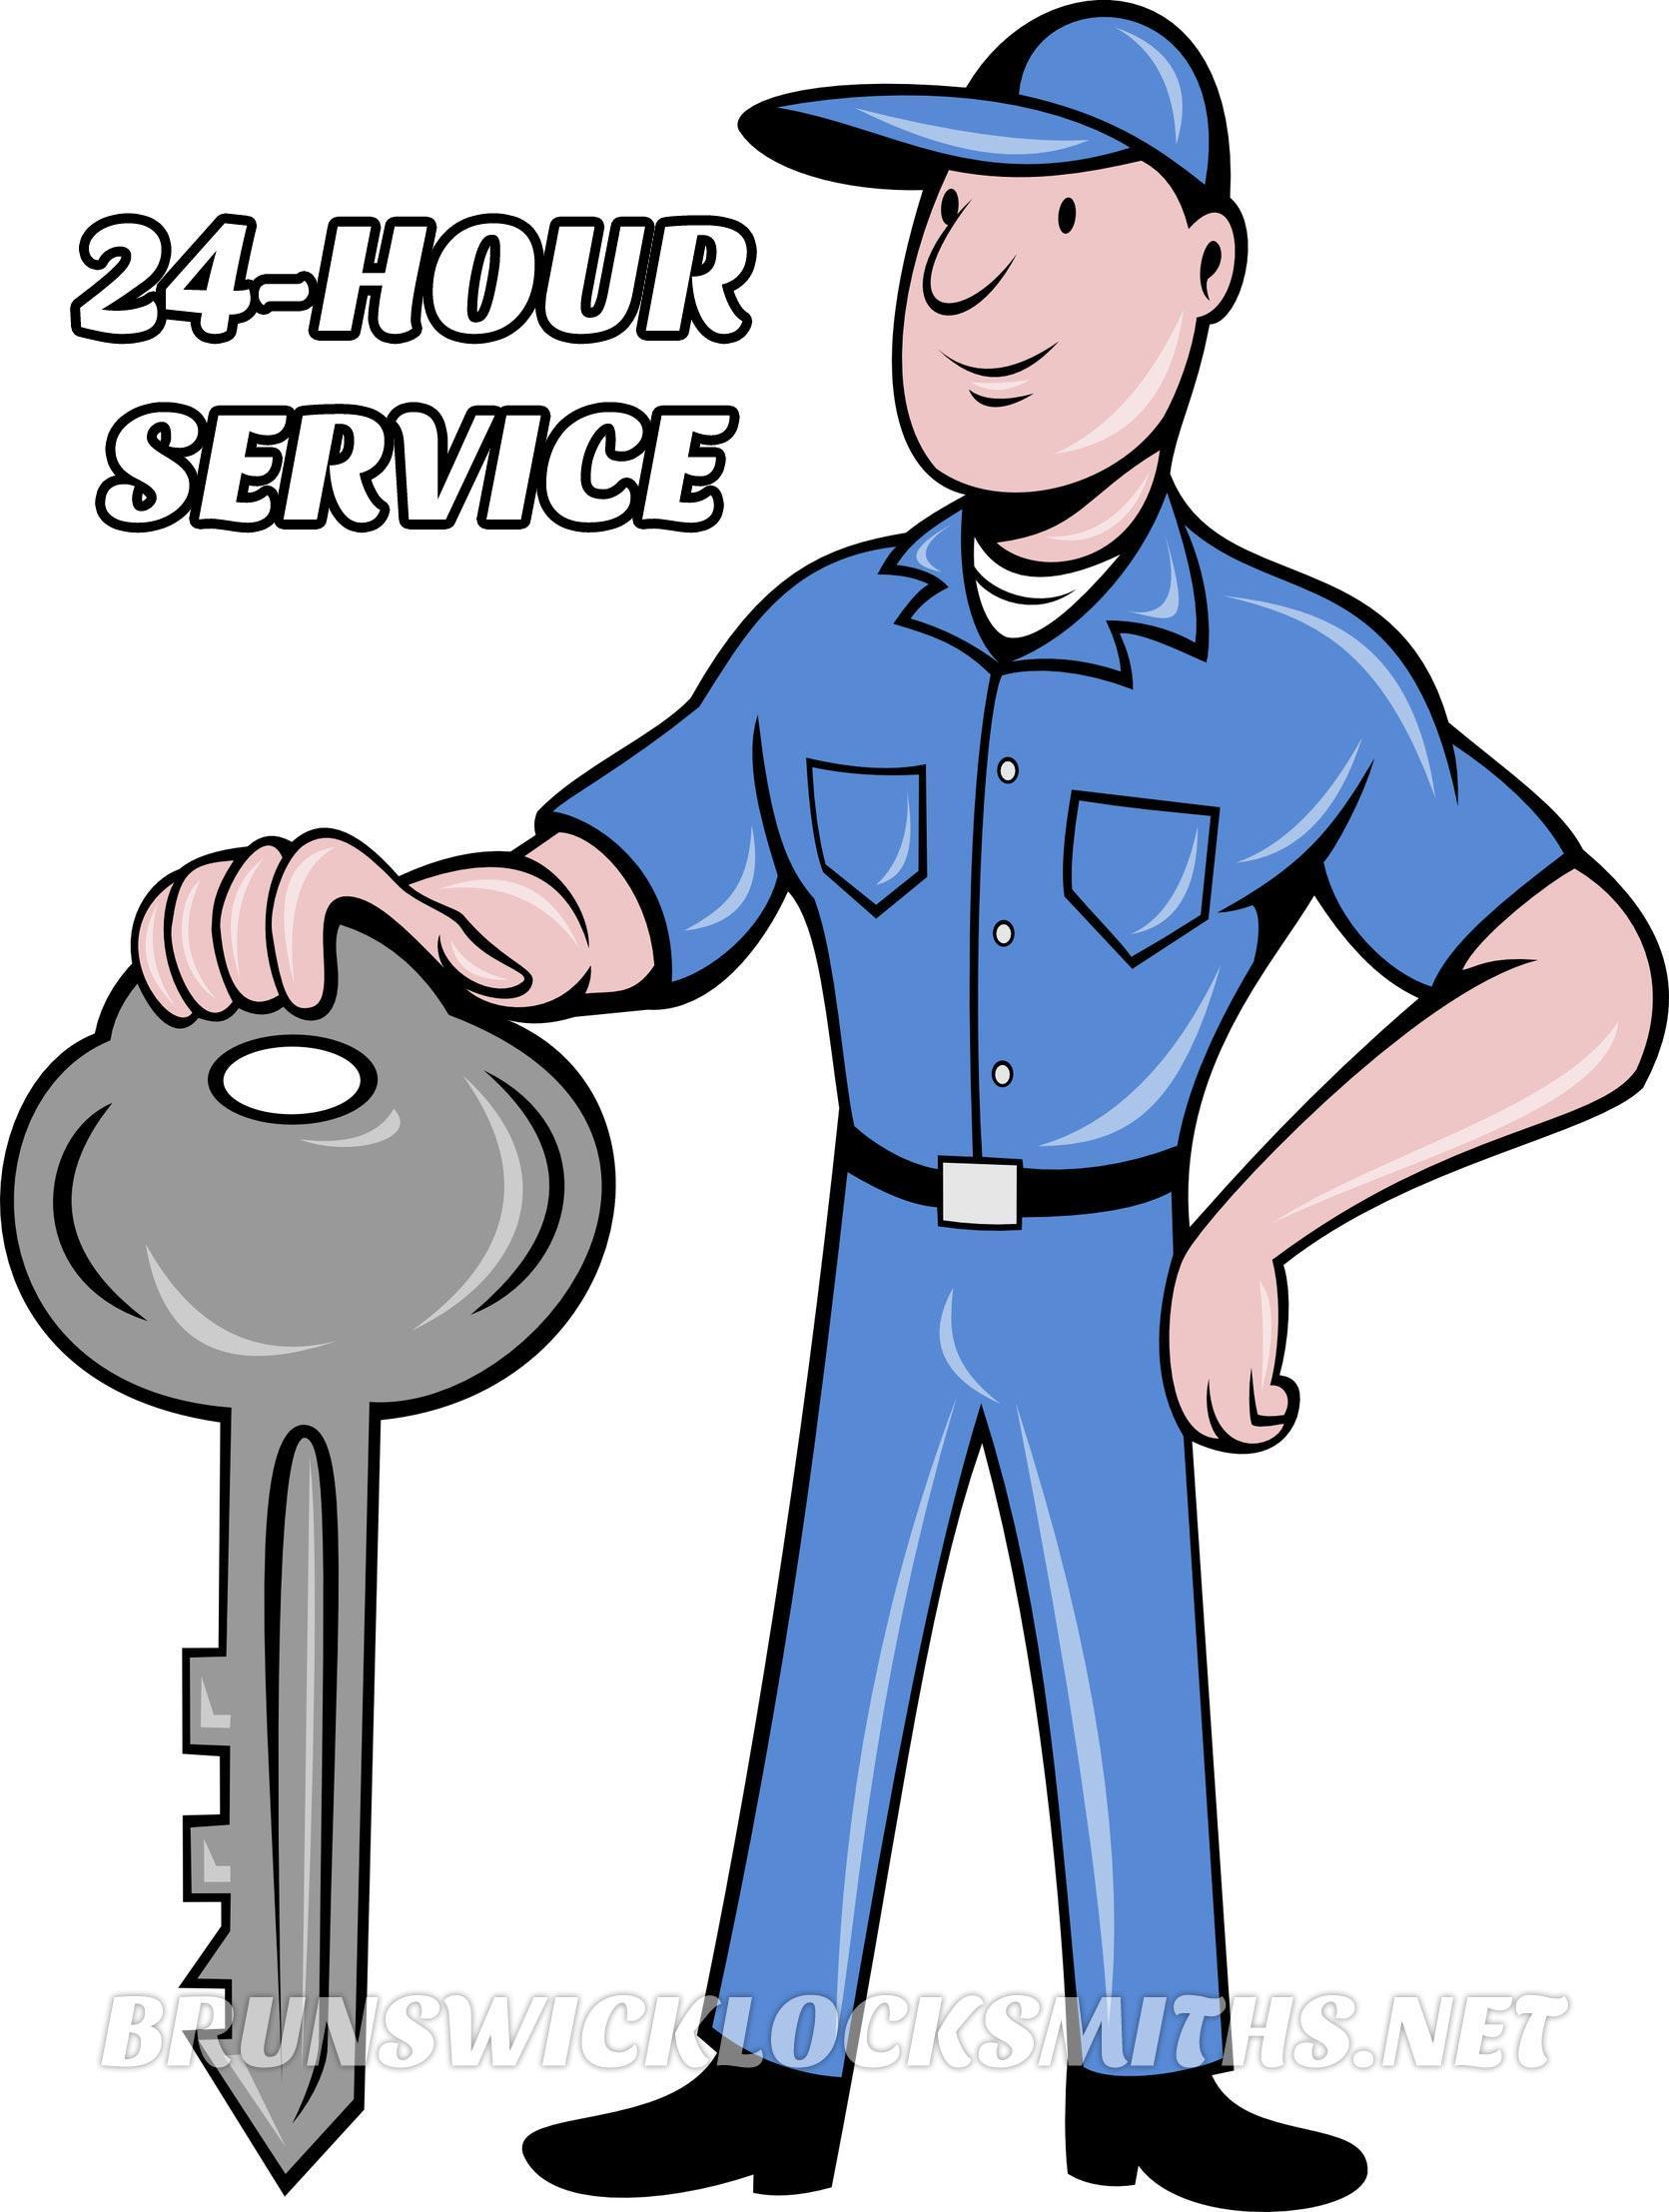 Brunswick Locksmith Services